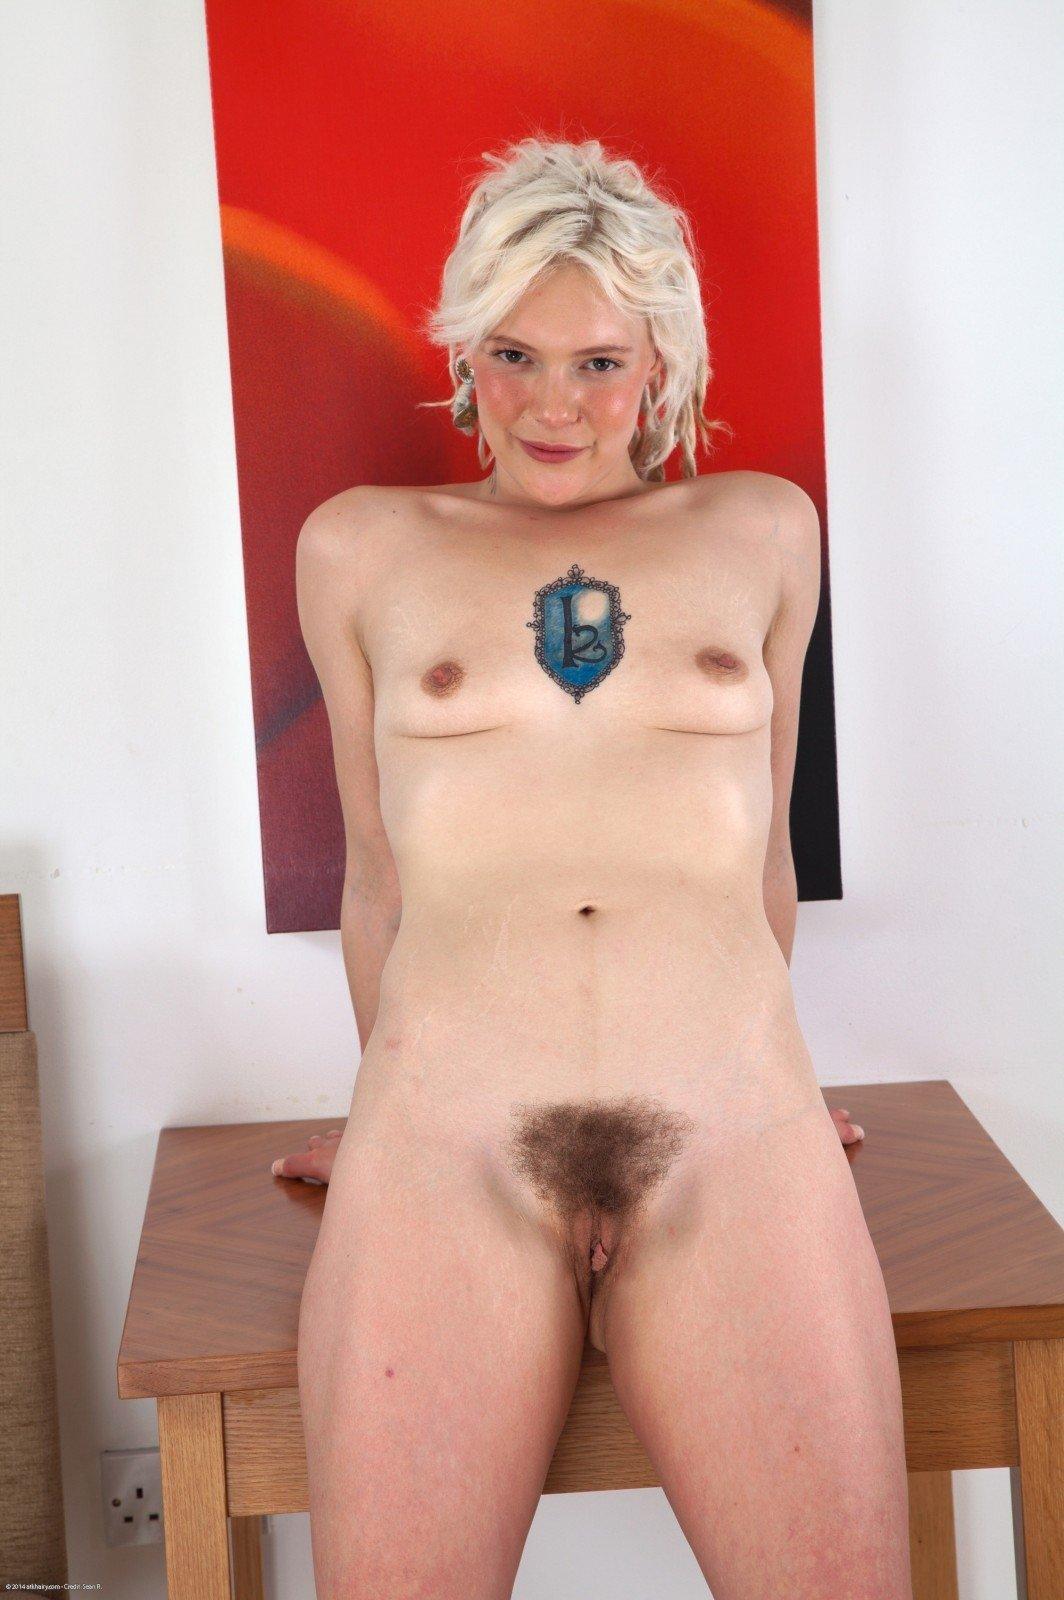 Дама из Скандинавии обнажила волосатая киска